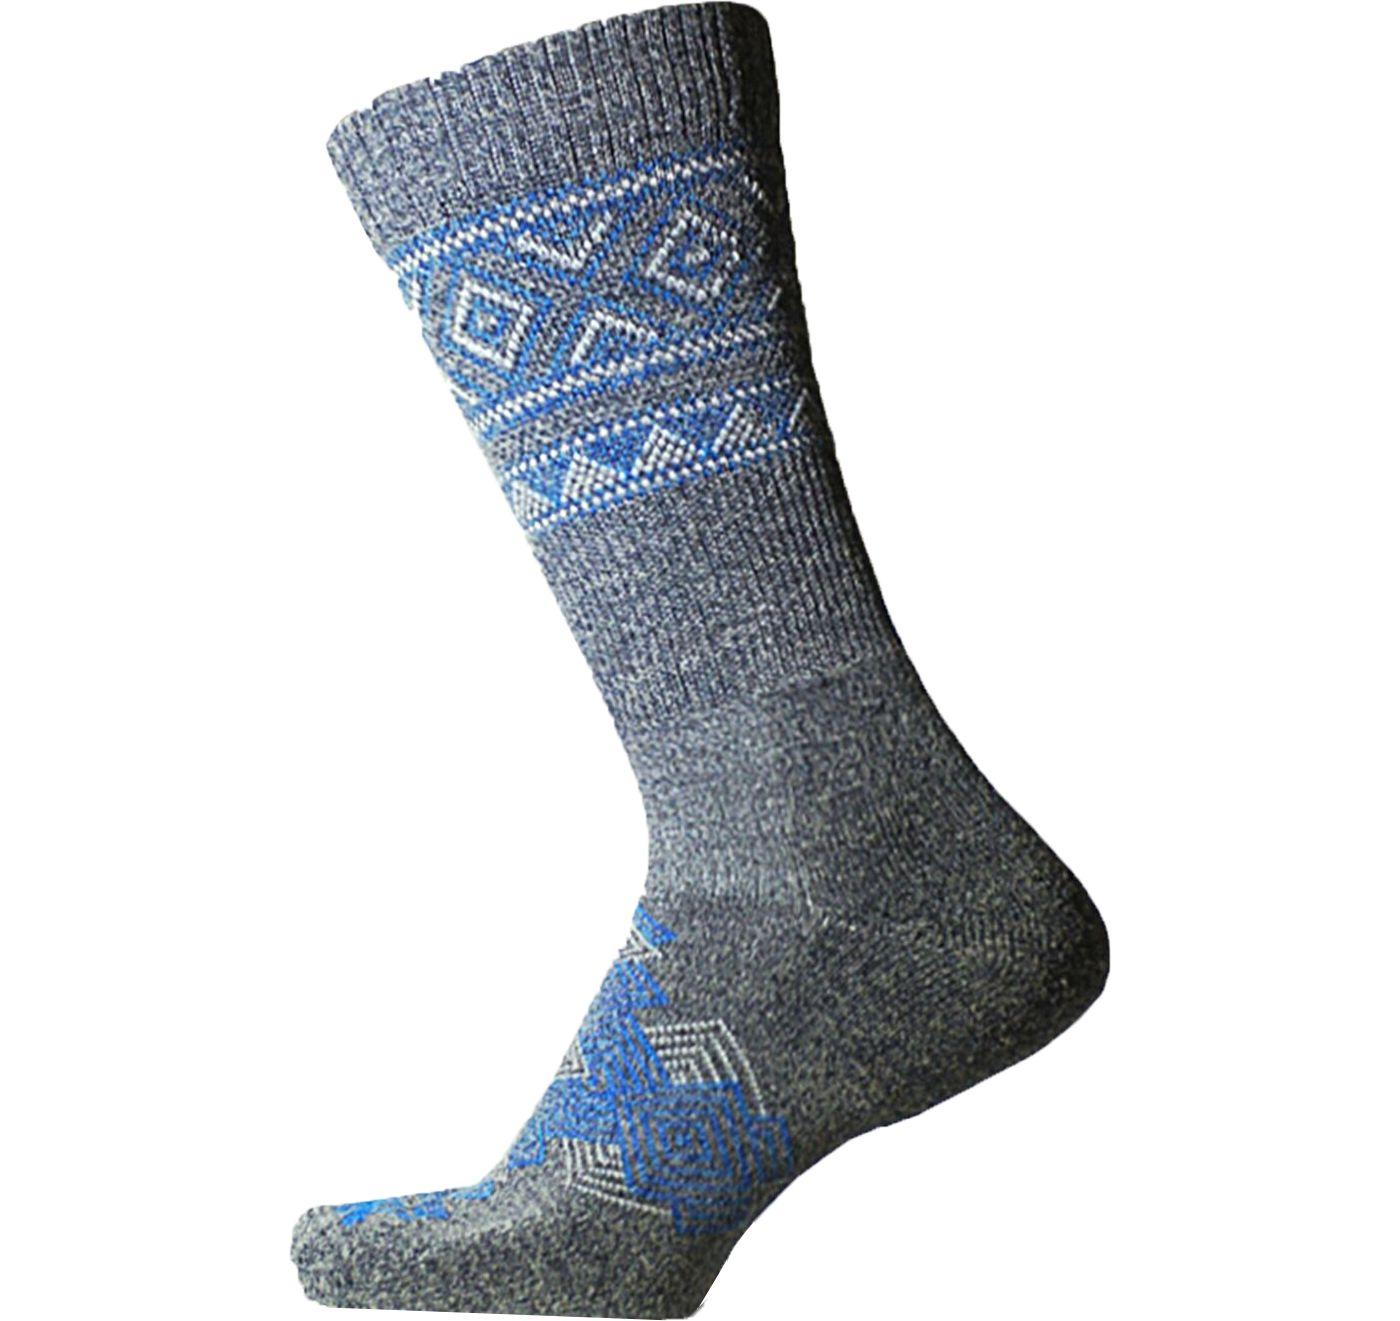 Thor-Lo Outdoor Traveler Crew Socks